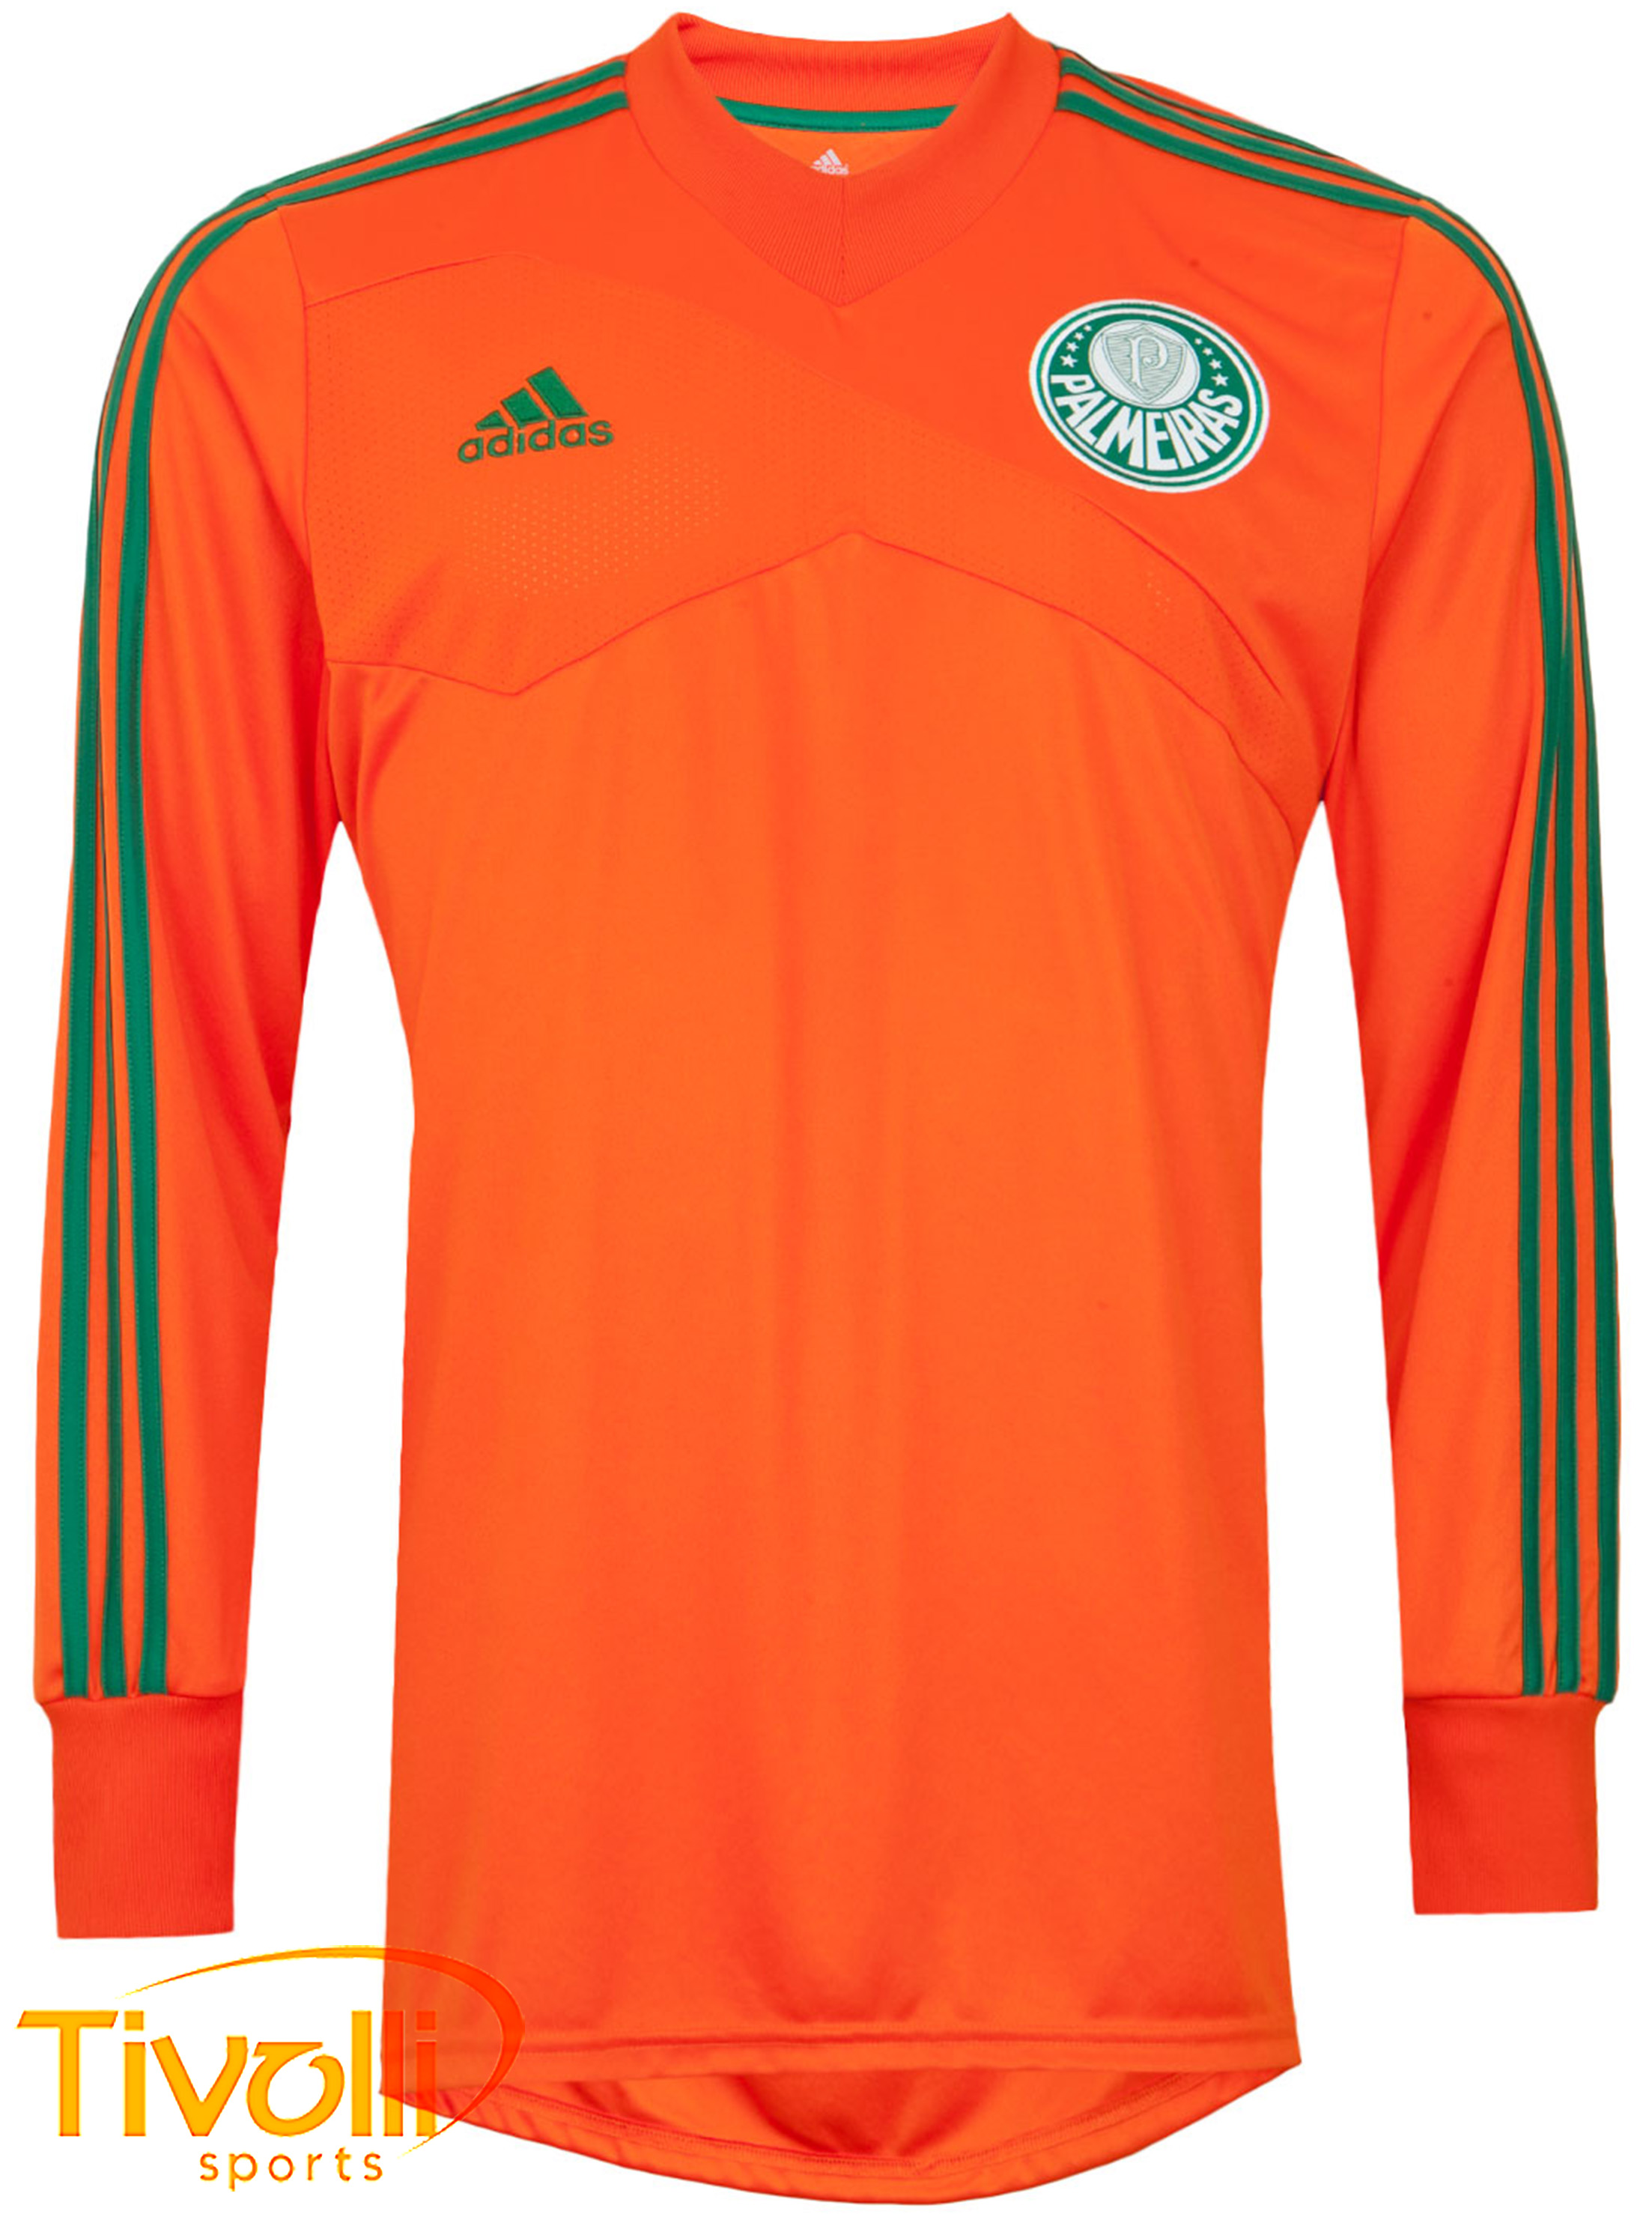 32b7cae034a56 Camisa Adidas   Palmeiras II GK Boys 2013